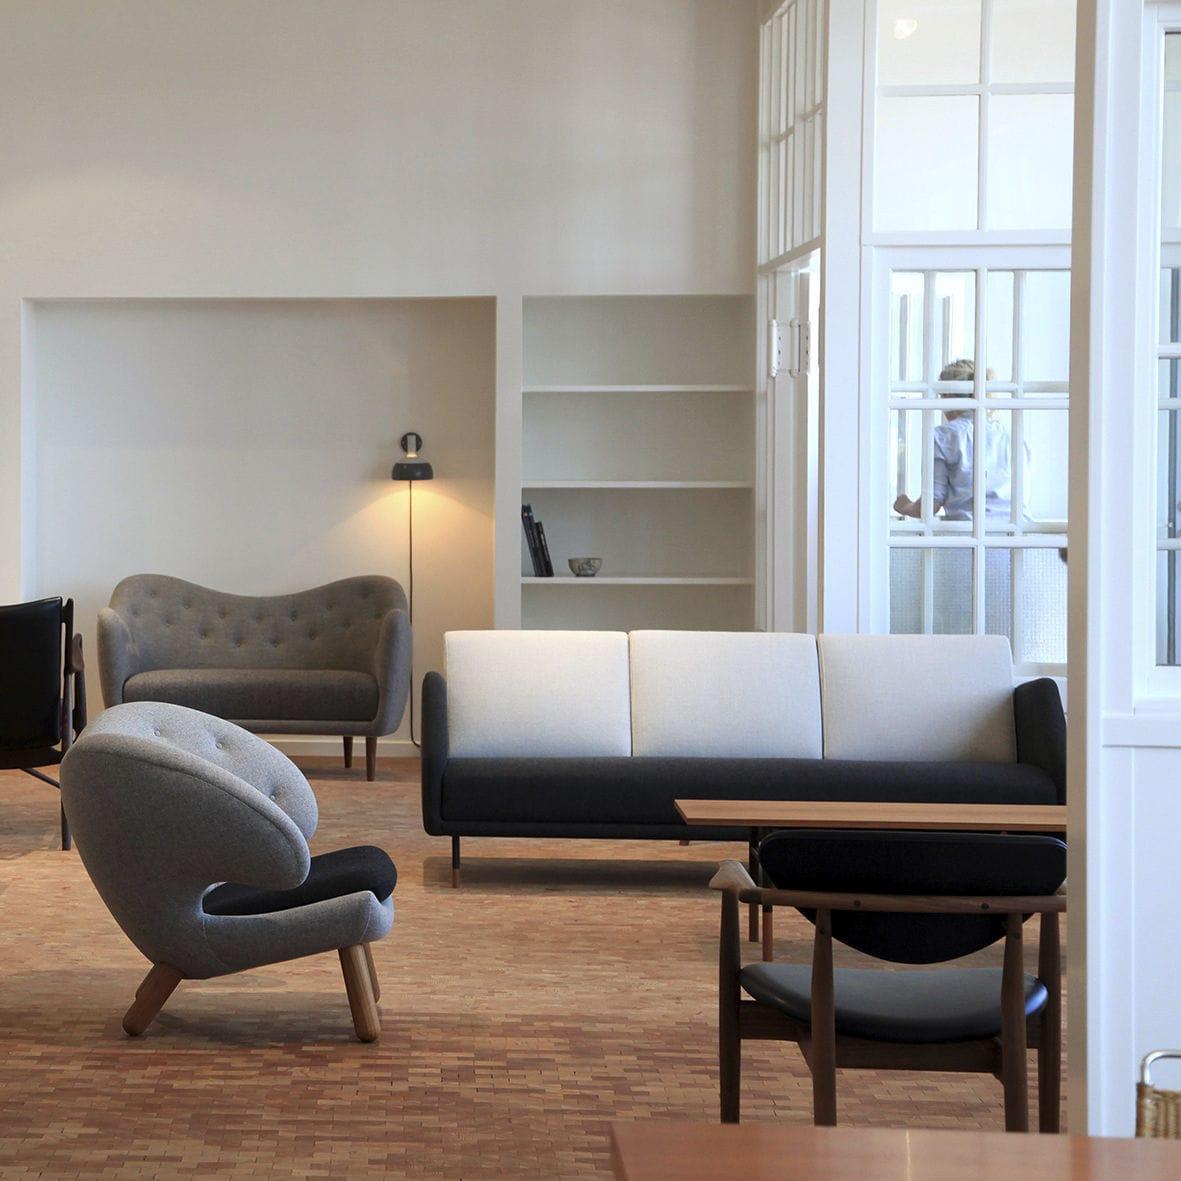 Finn juhl the baker sofa -  Scandinavian Design Sofa Fabric By Finn Juhl 3 Seater 53 One Collection